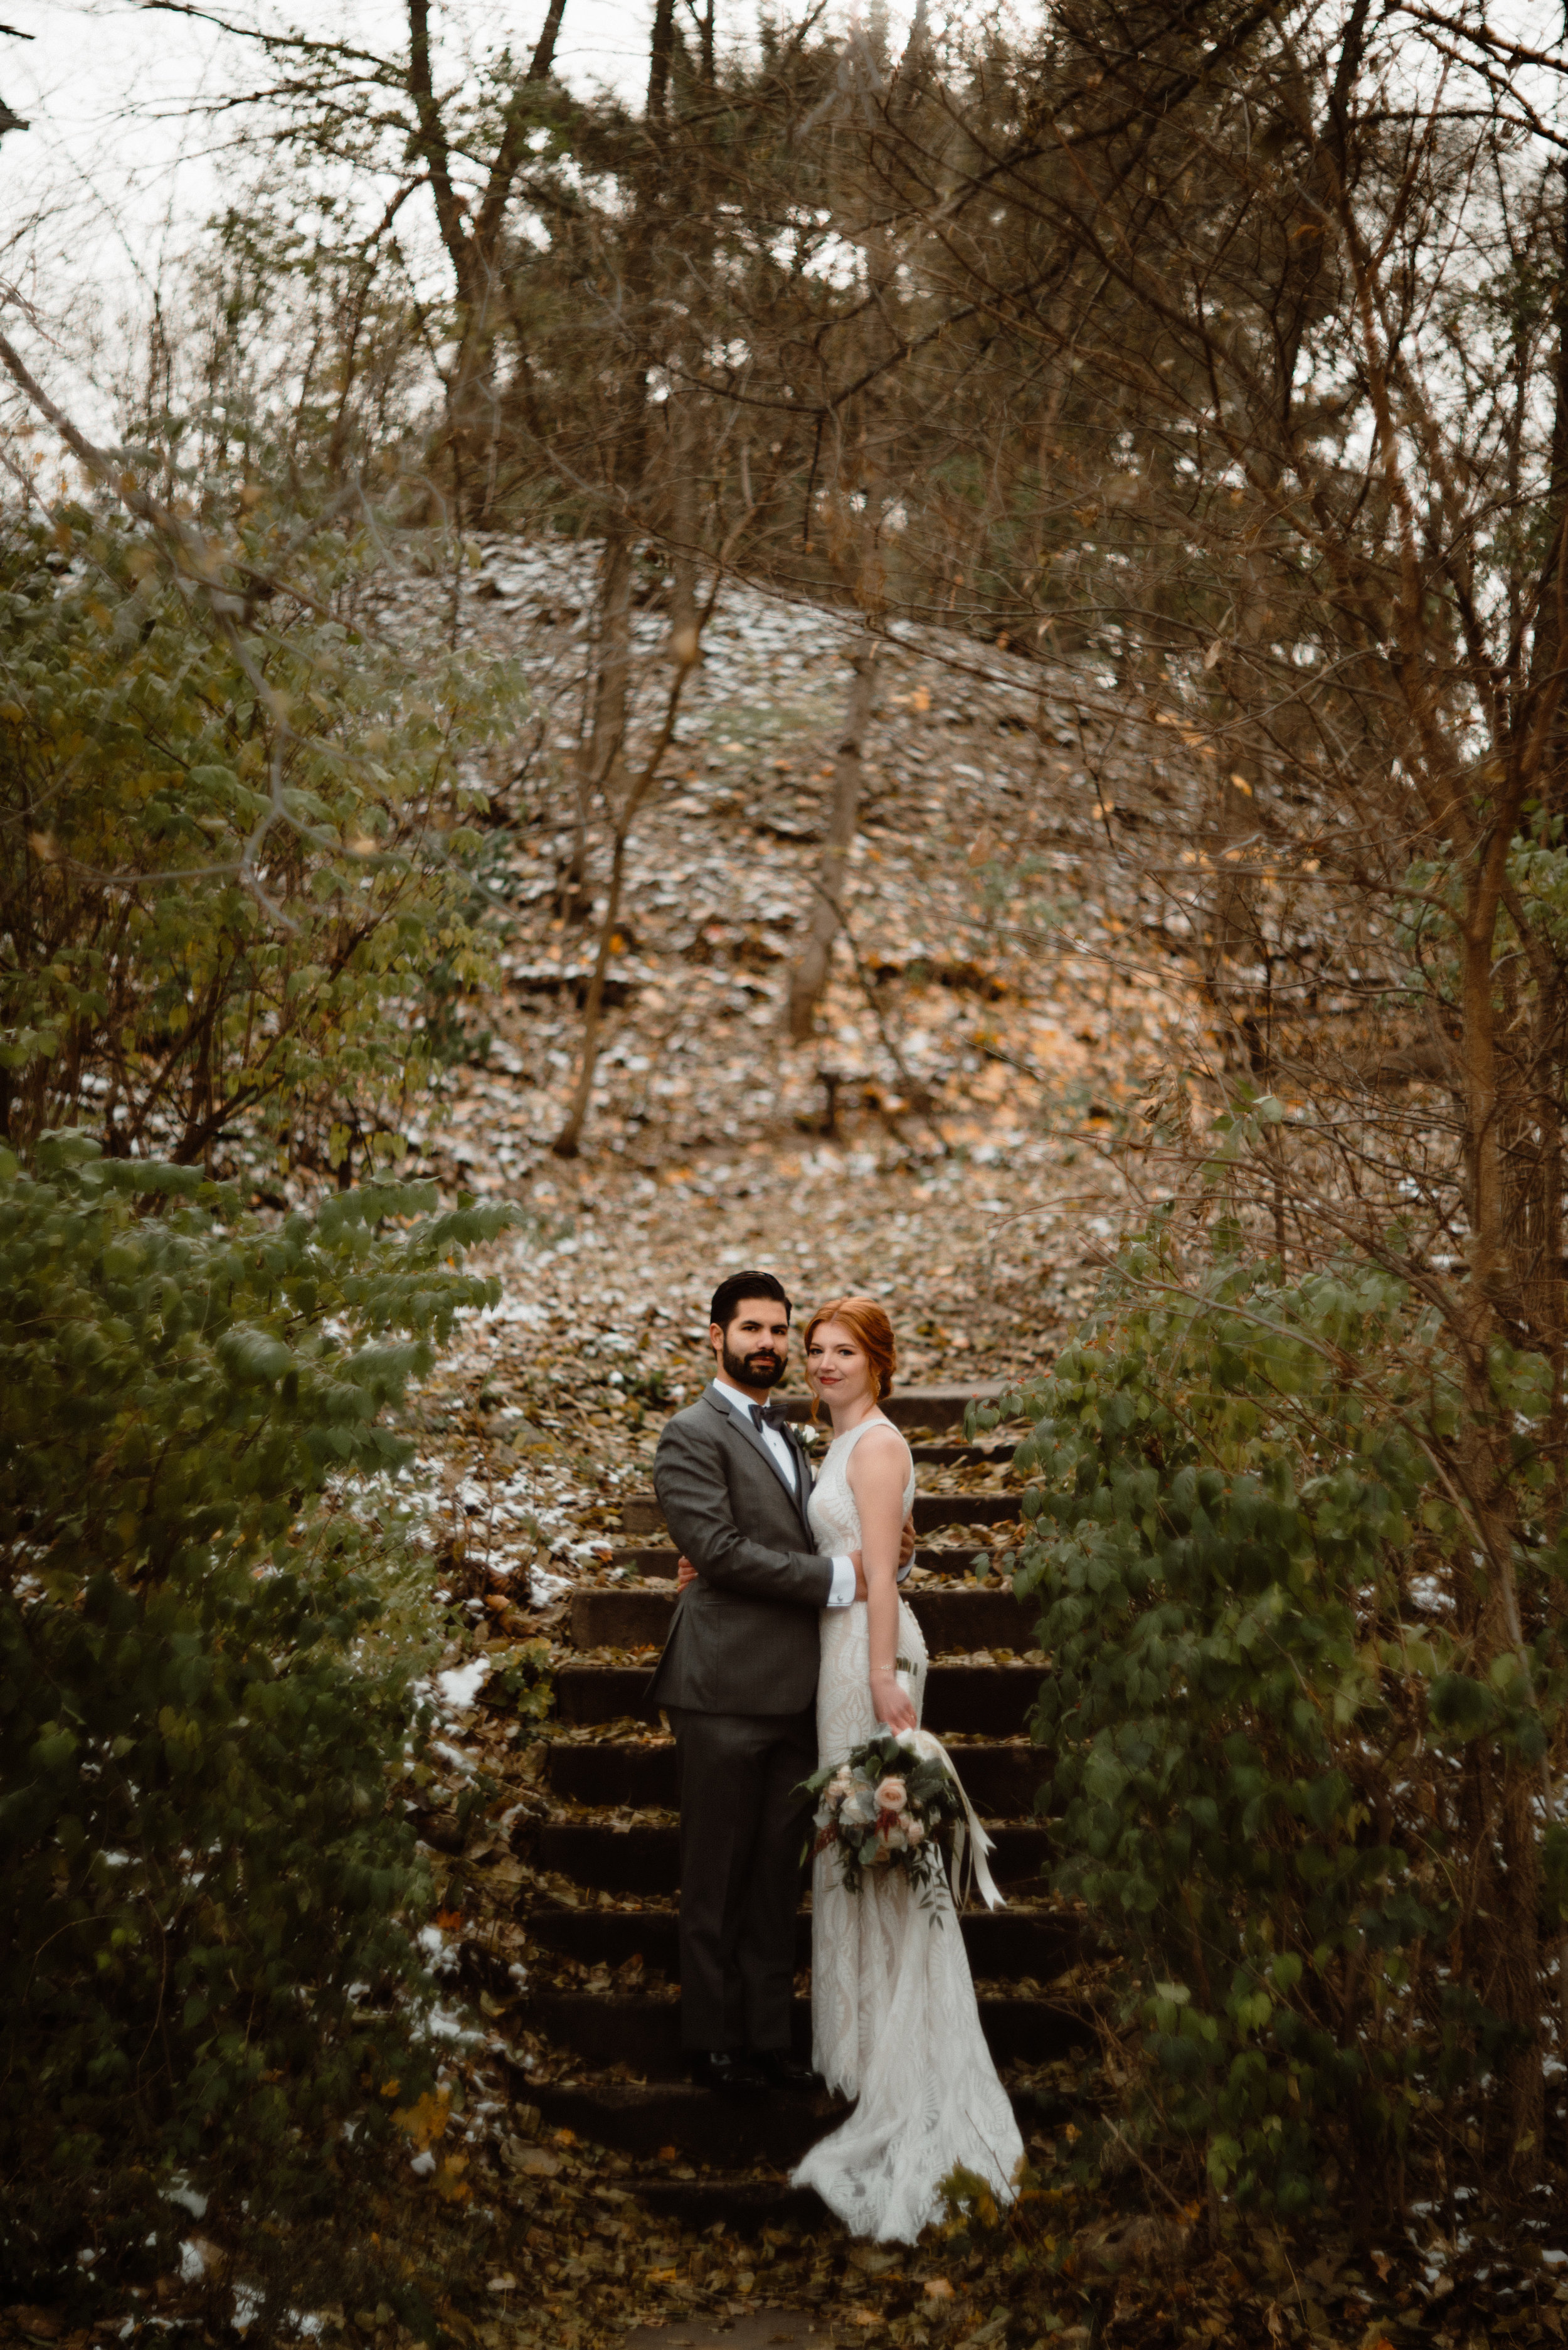 The Brix on Fox, Chicago Wedding Photographer, Zach and Rosalie00056.jpg